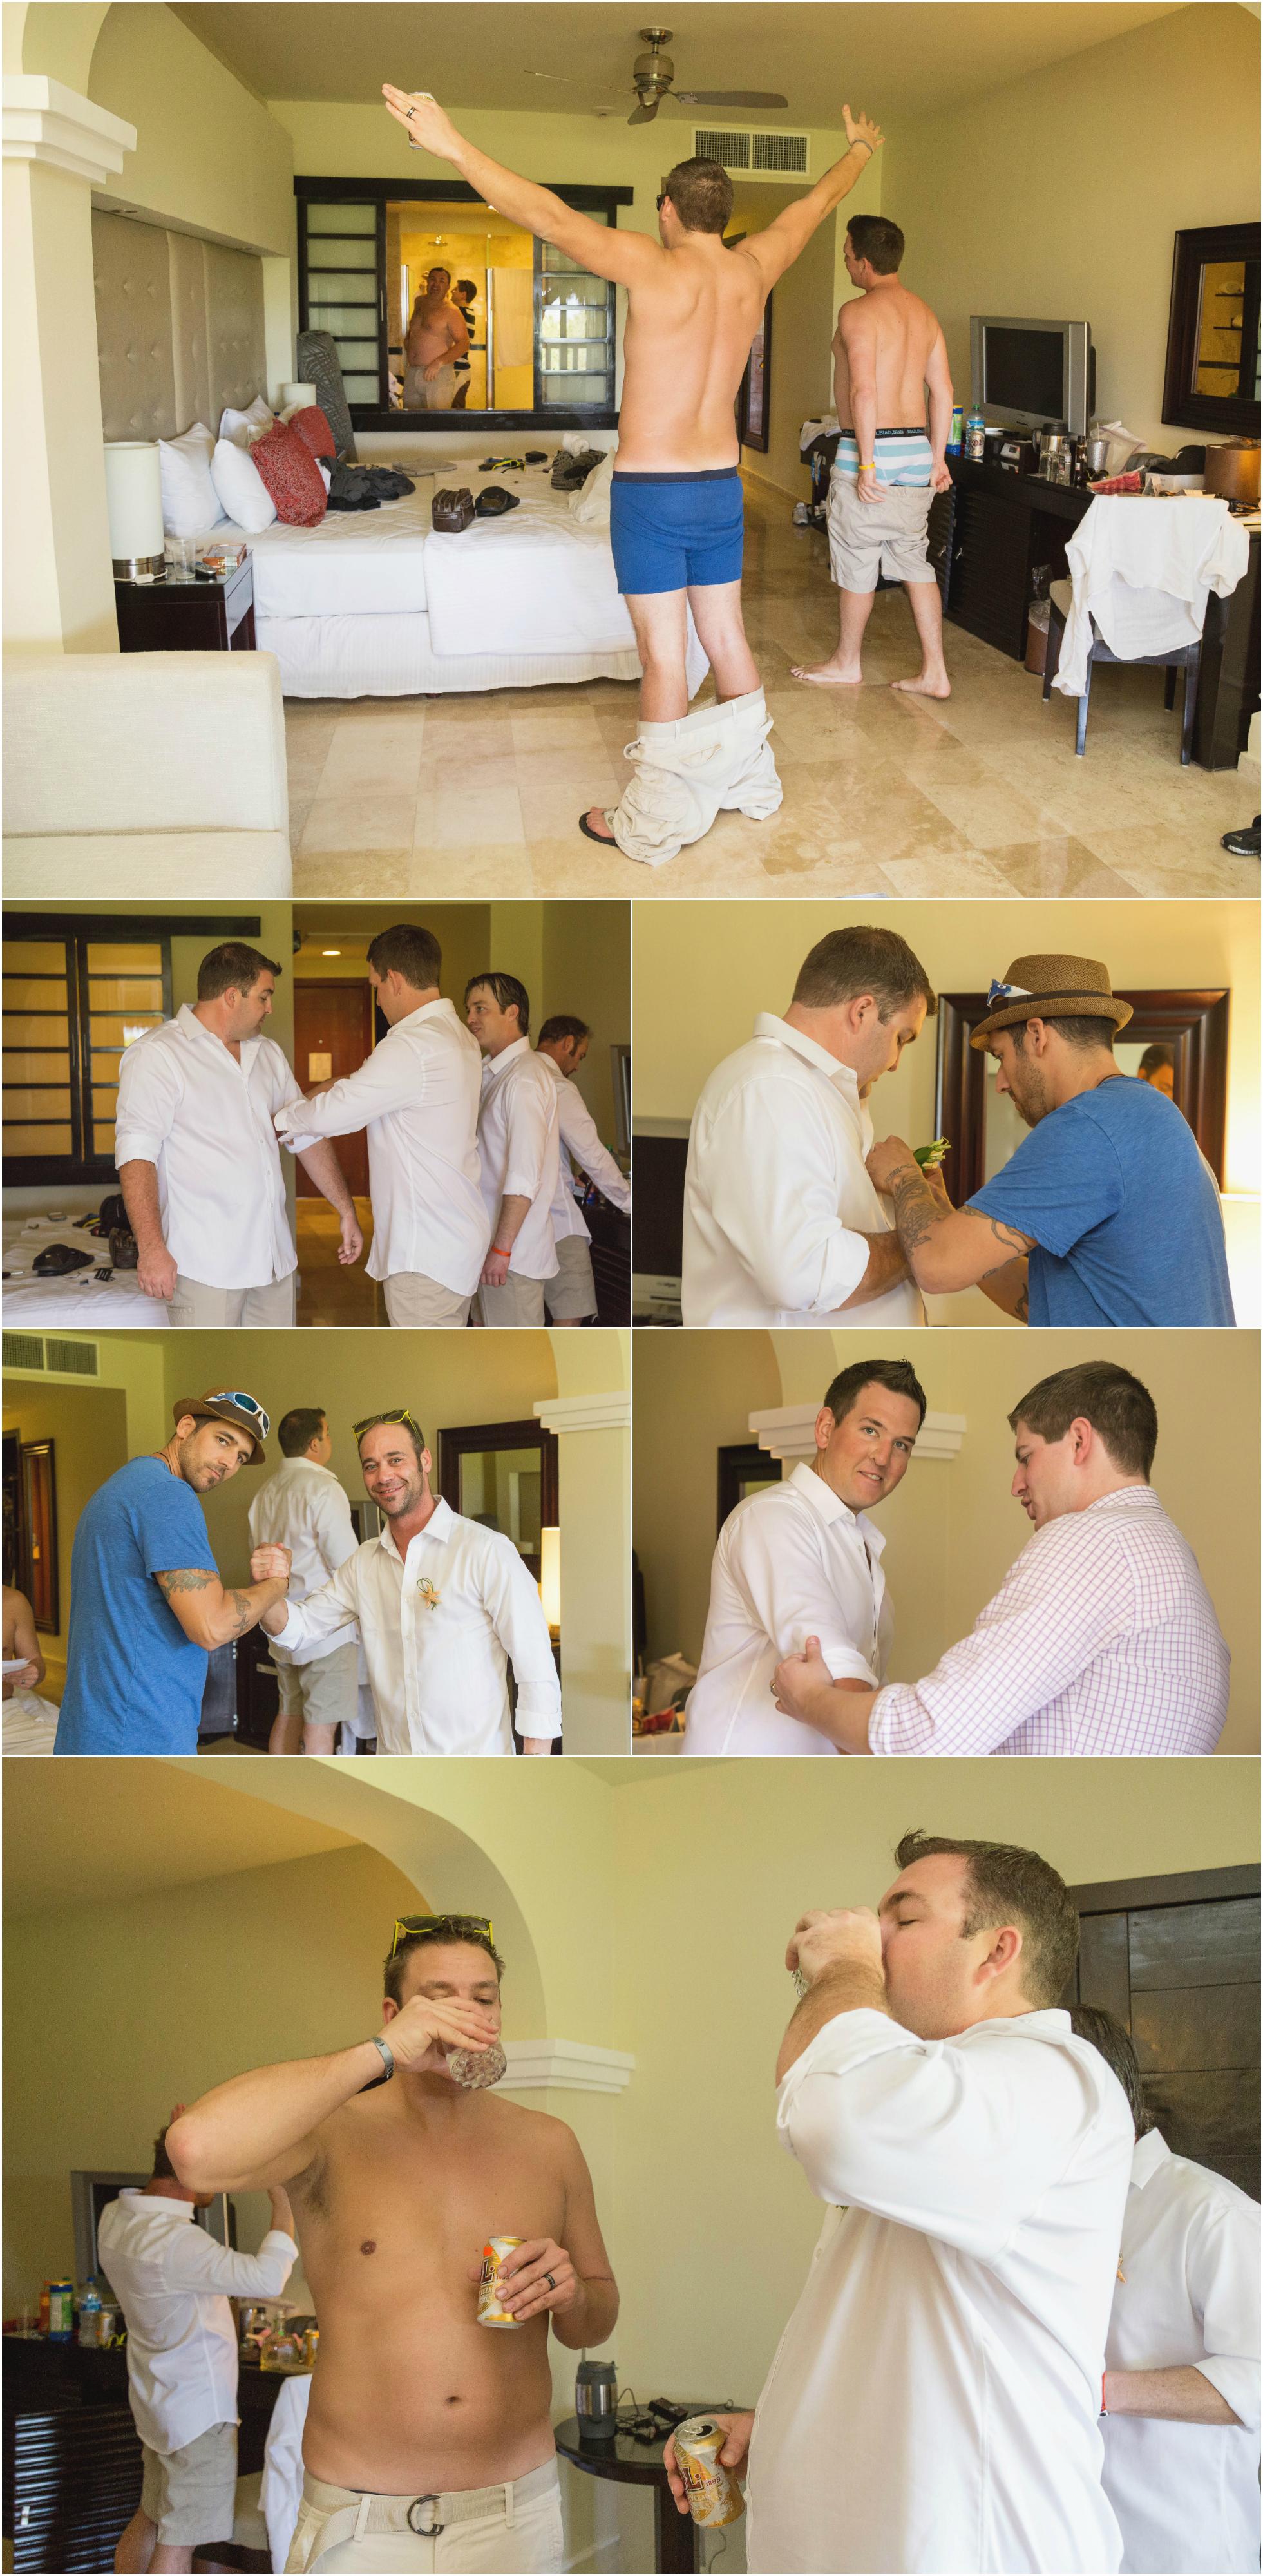 cancun_wedding14.png